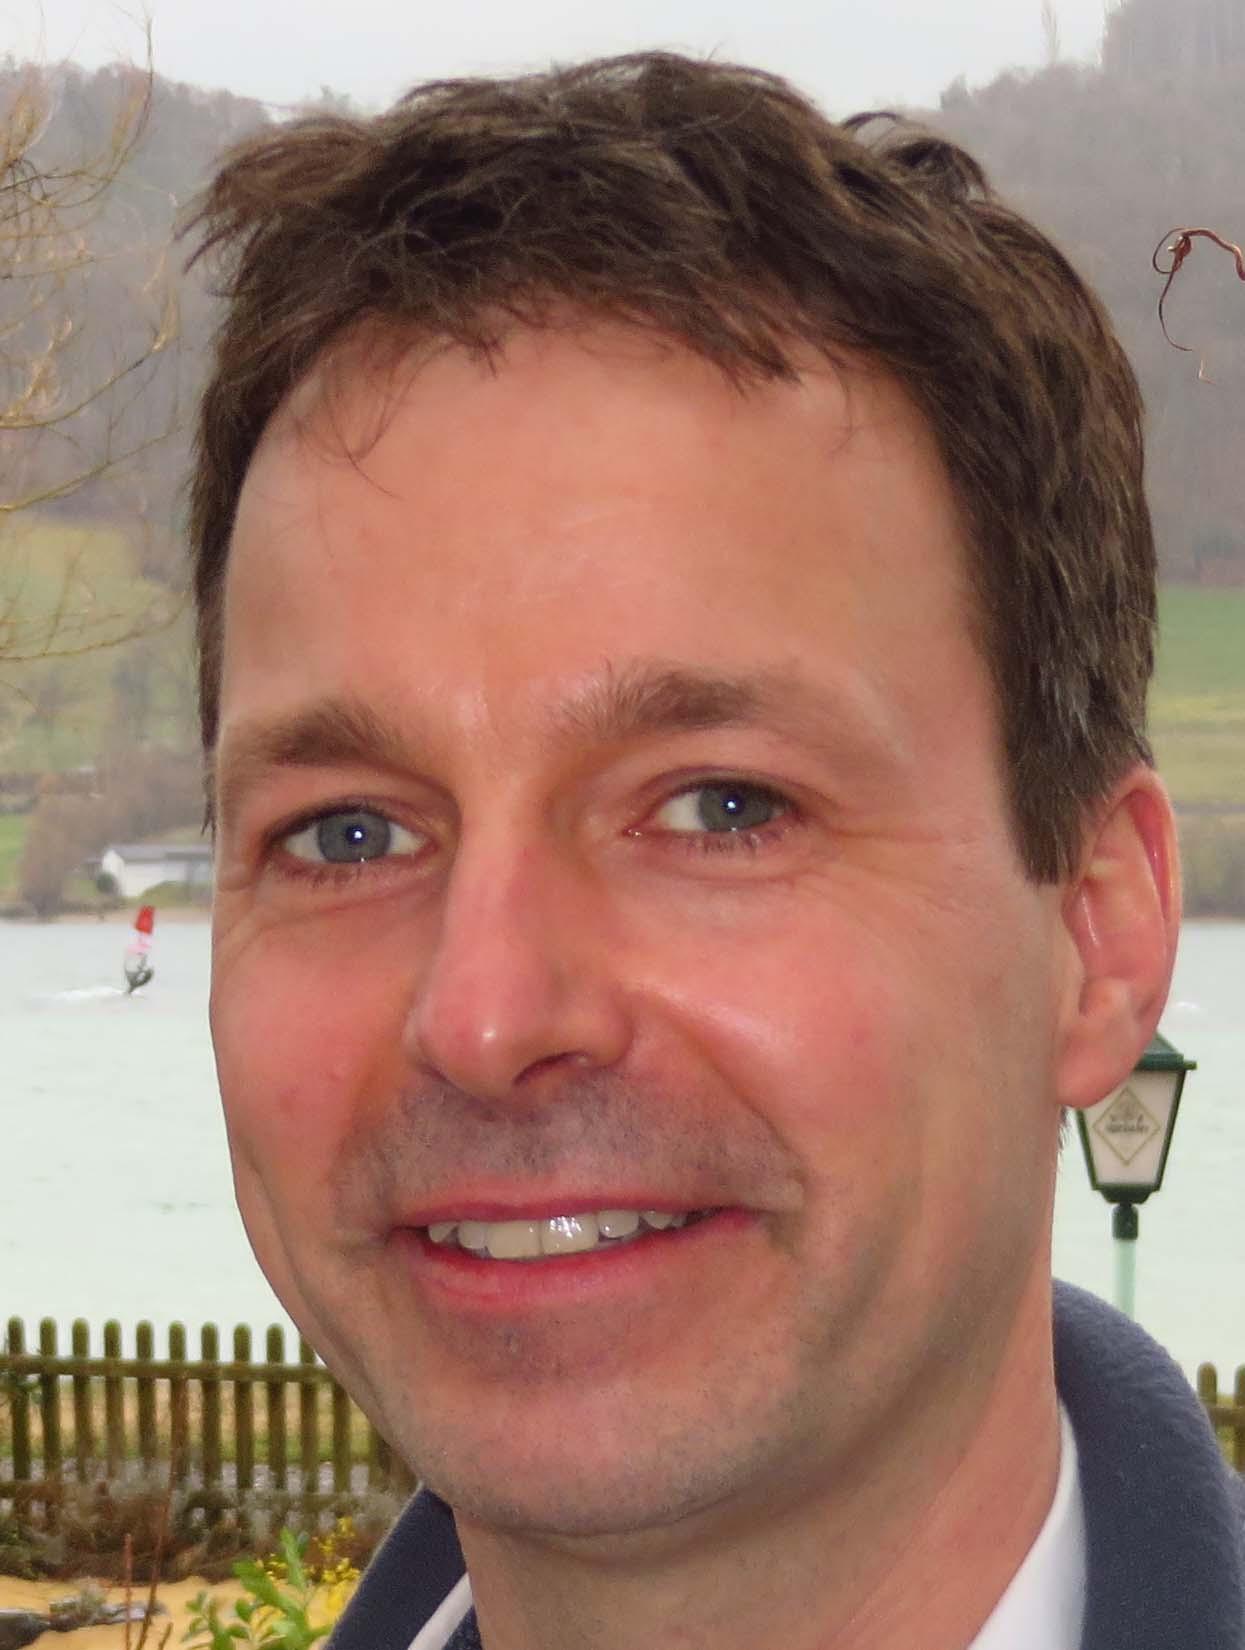 Michael-Wilhelm Brouwer